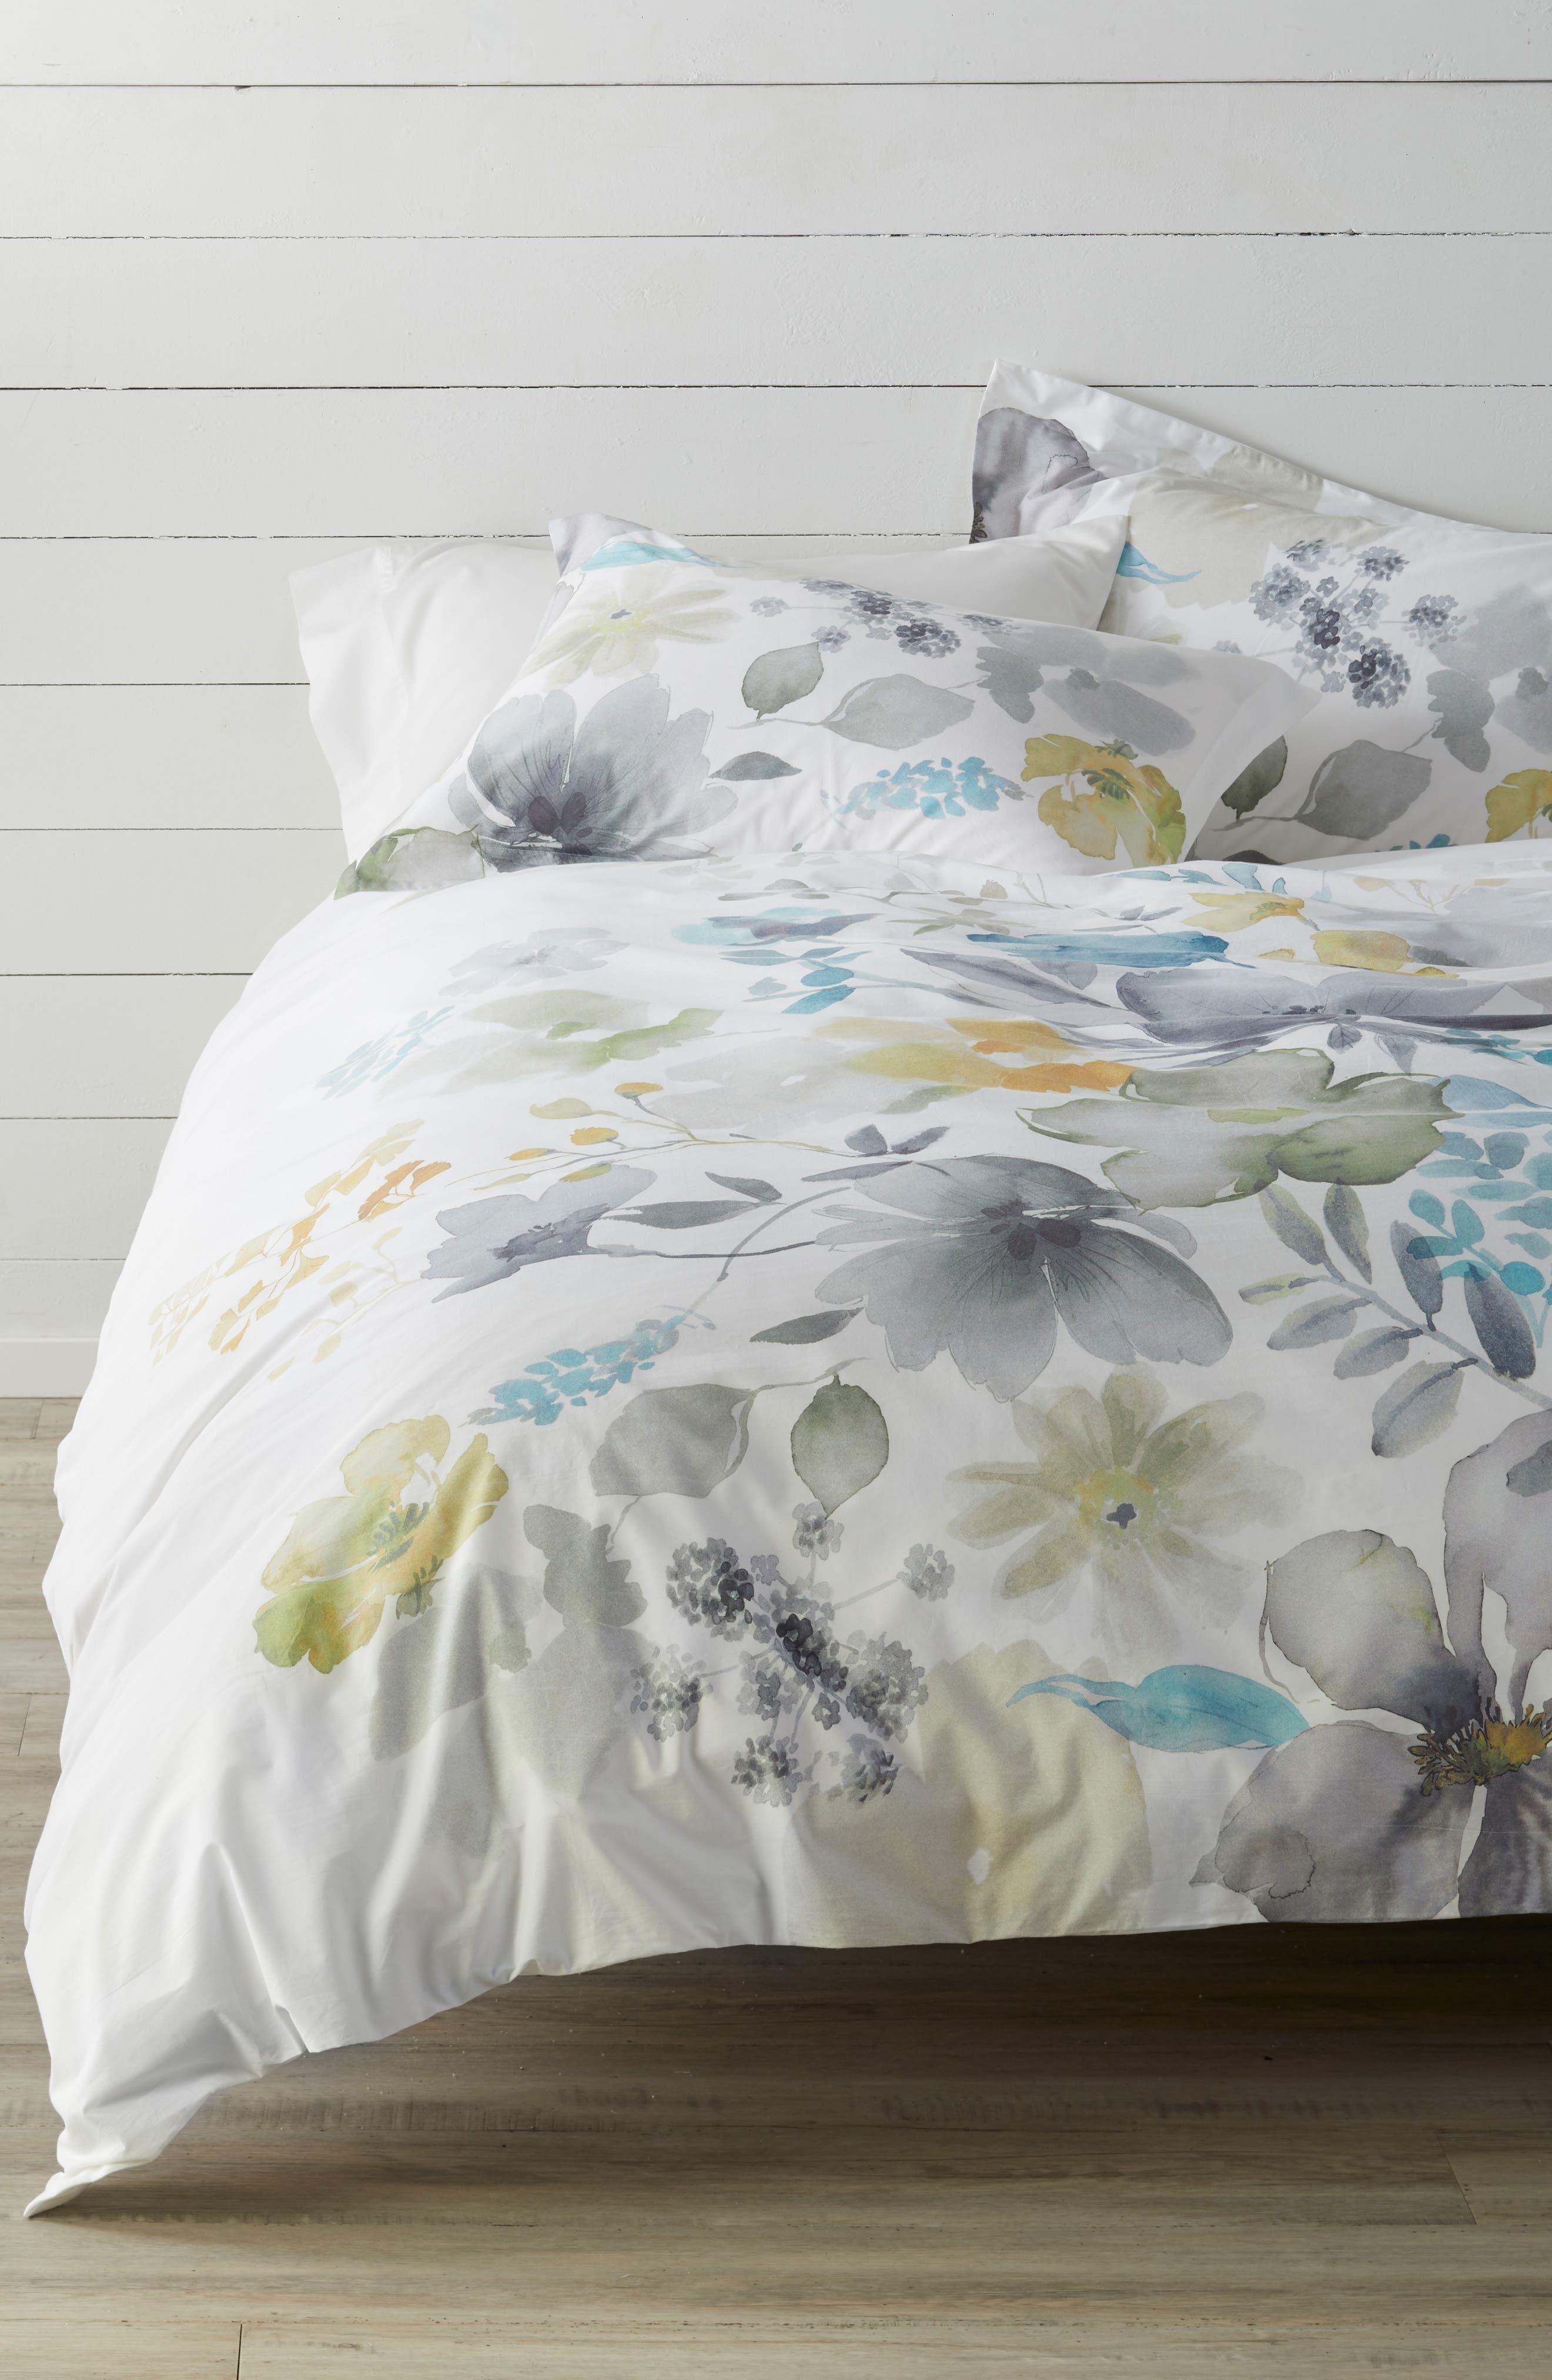 LEVTEX Fairbourne 300 Thread Count Cotton Percale Duvet Cover, Main, color, MULTI